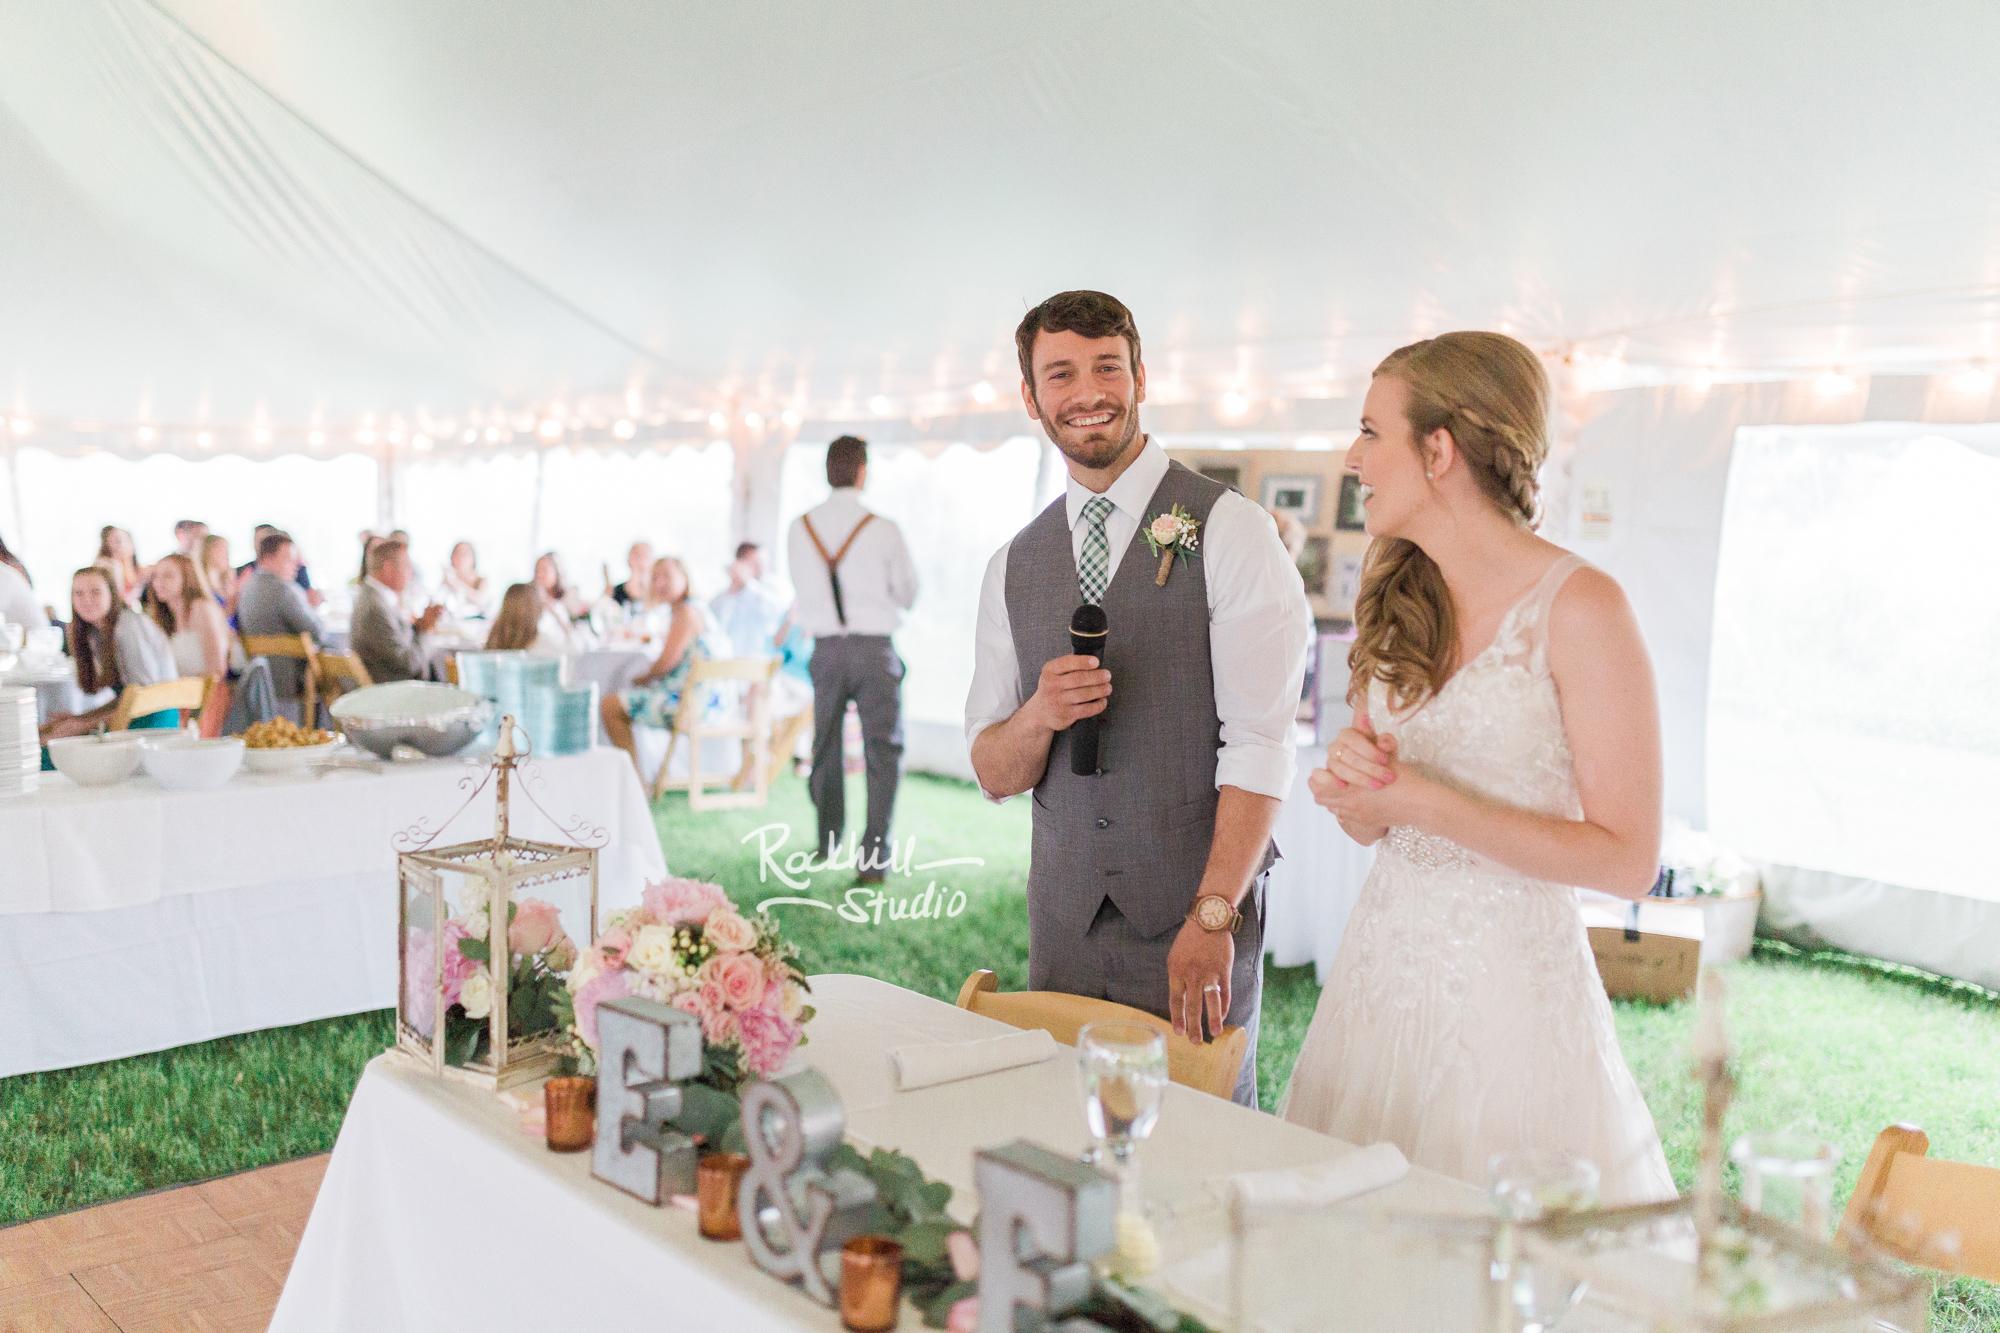 marquette-michigan-wedding-upper-peninsula-spring-photography-rockhill-ee-61.jpg